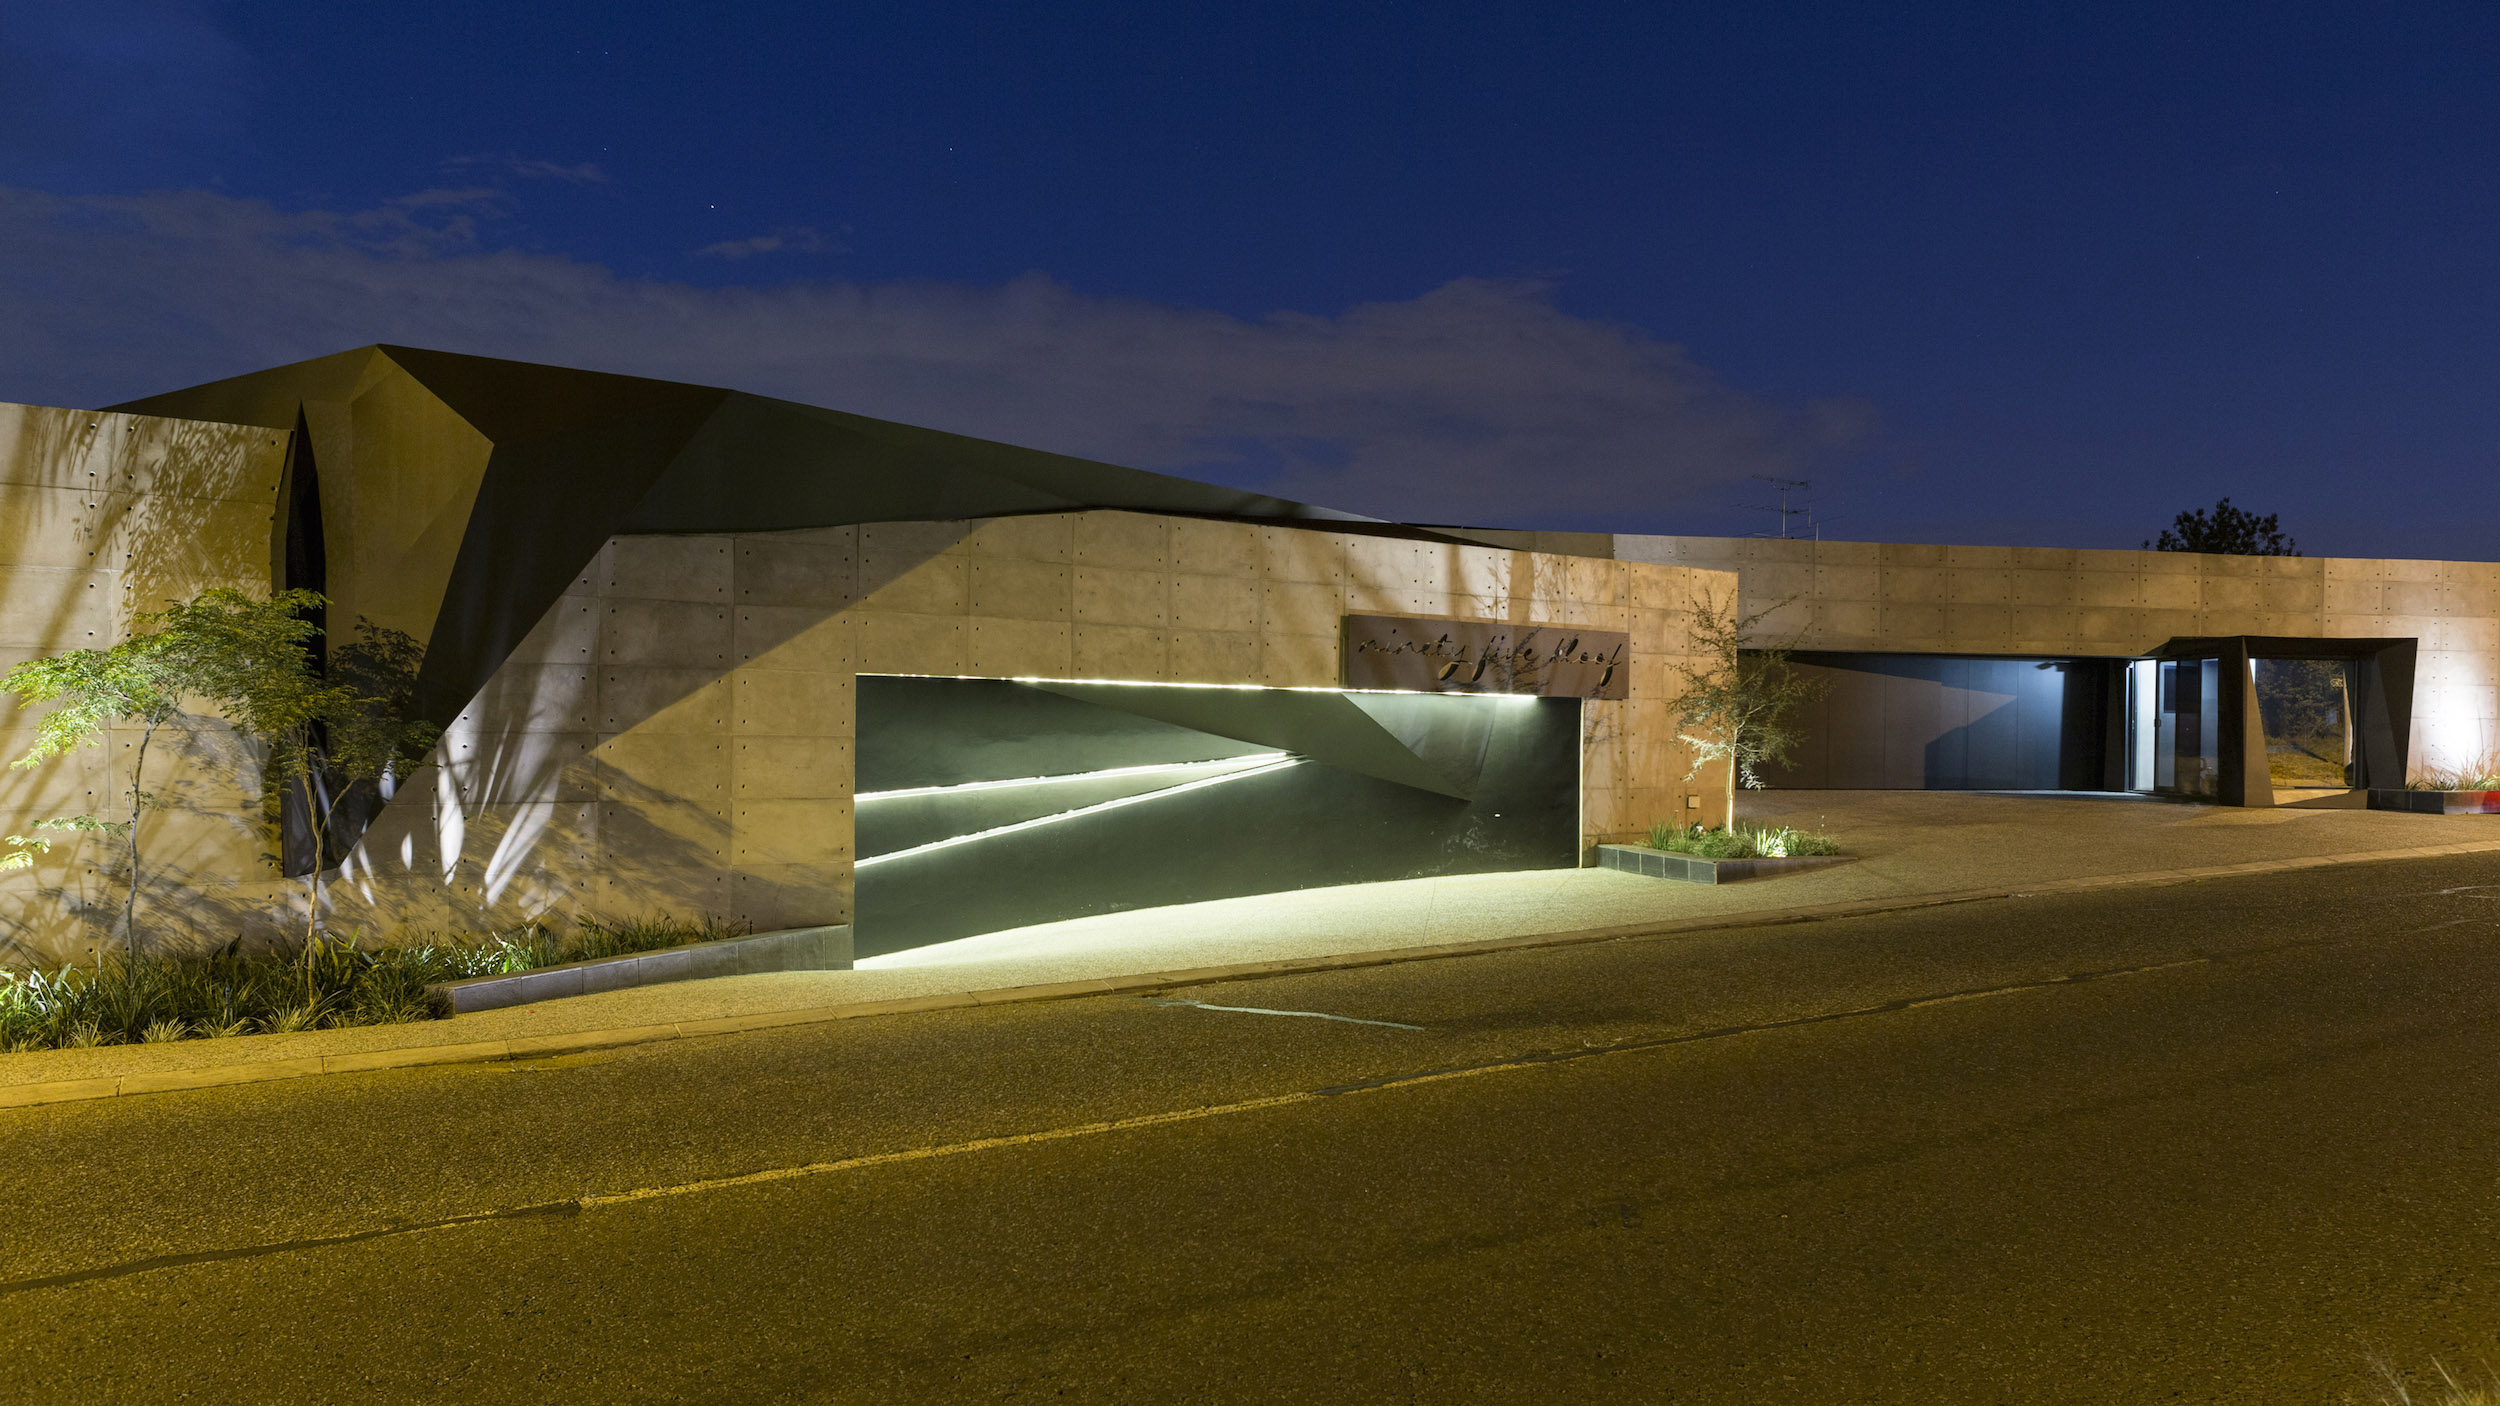 Kloof Road Masterpiece House in Johannesburg by Nico van der Meulen Architects-01